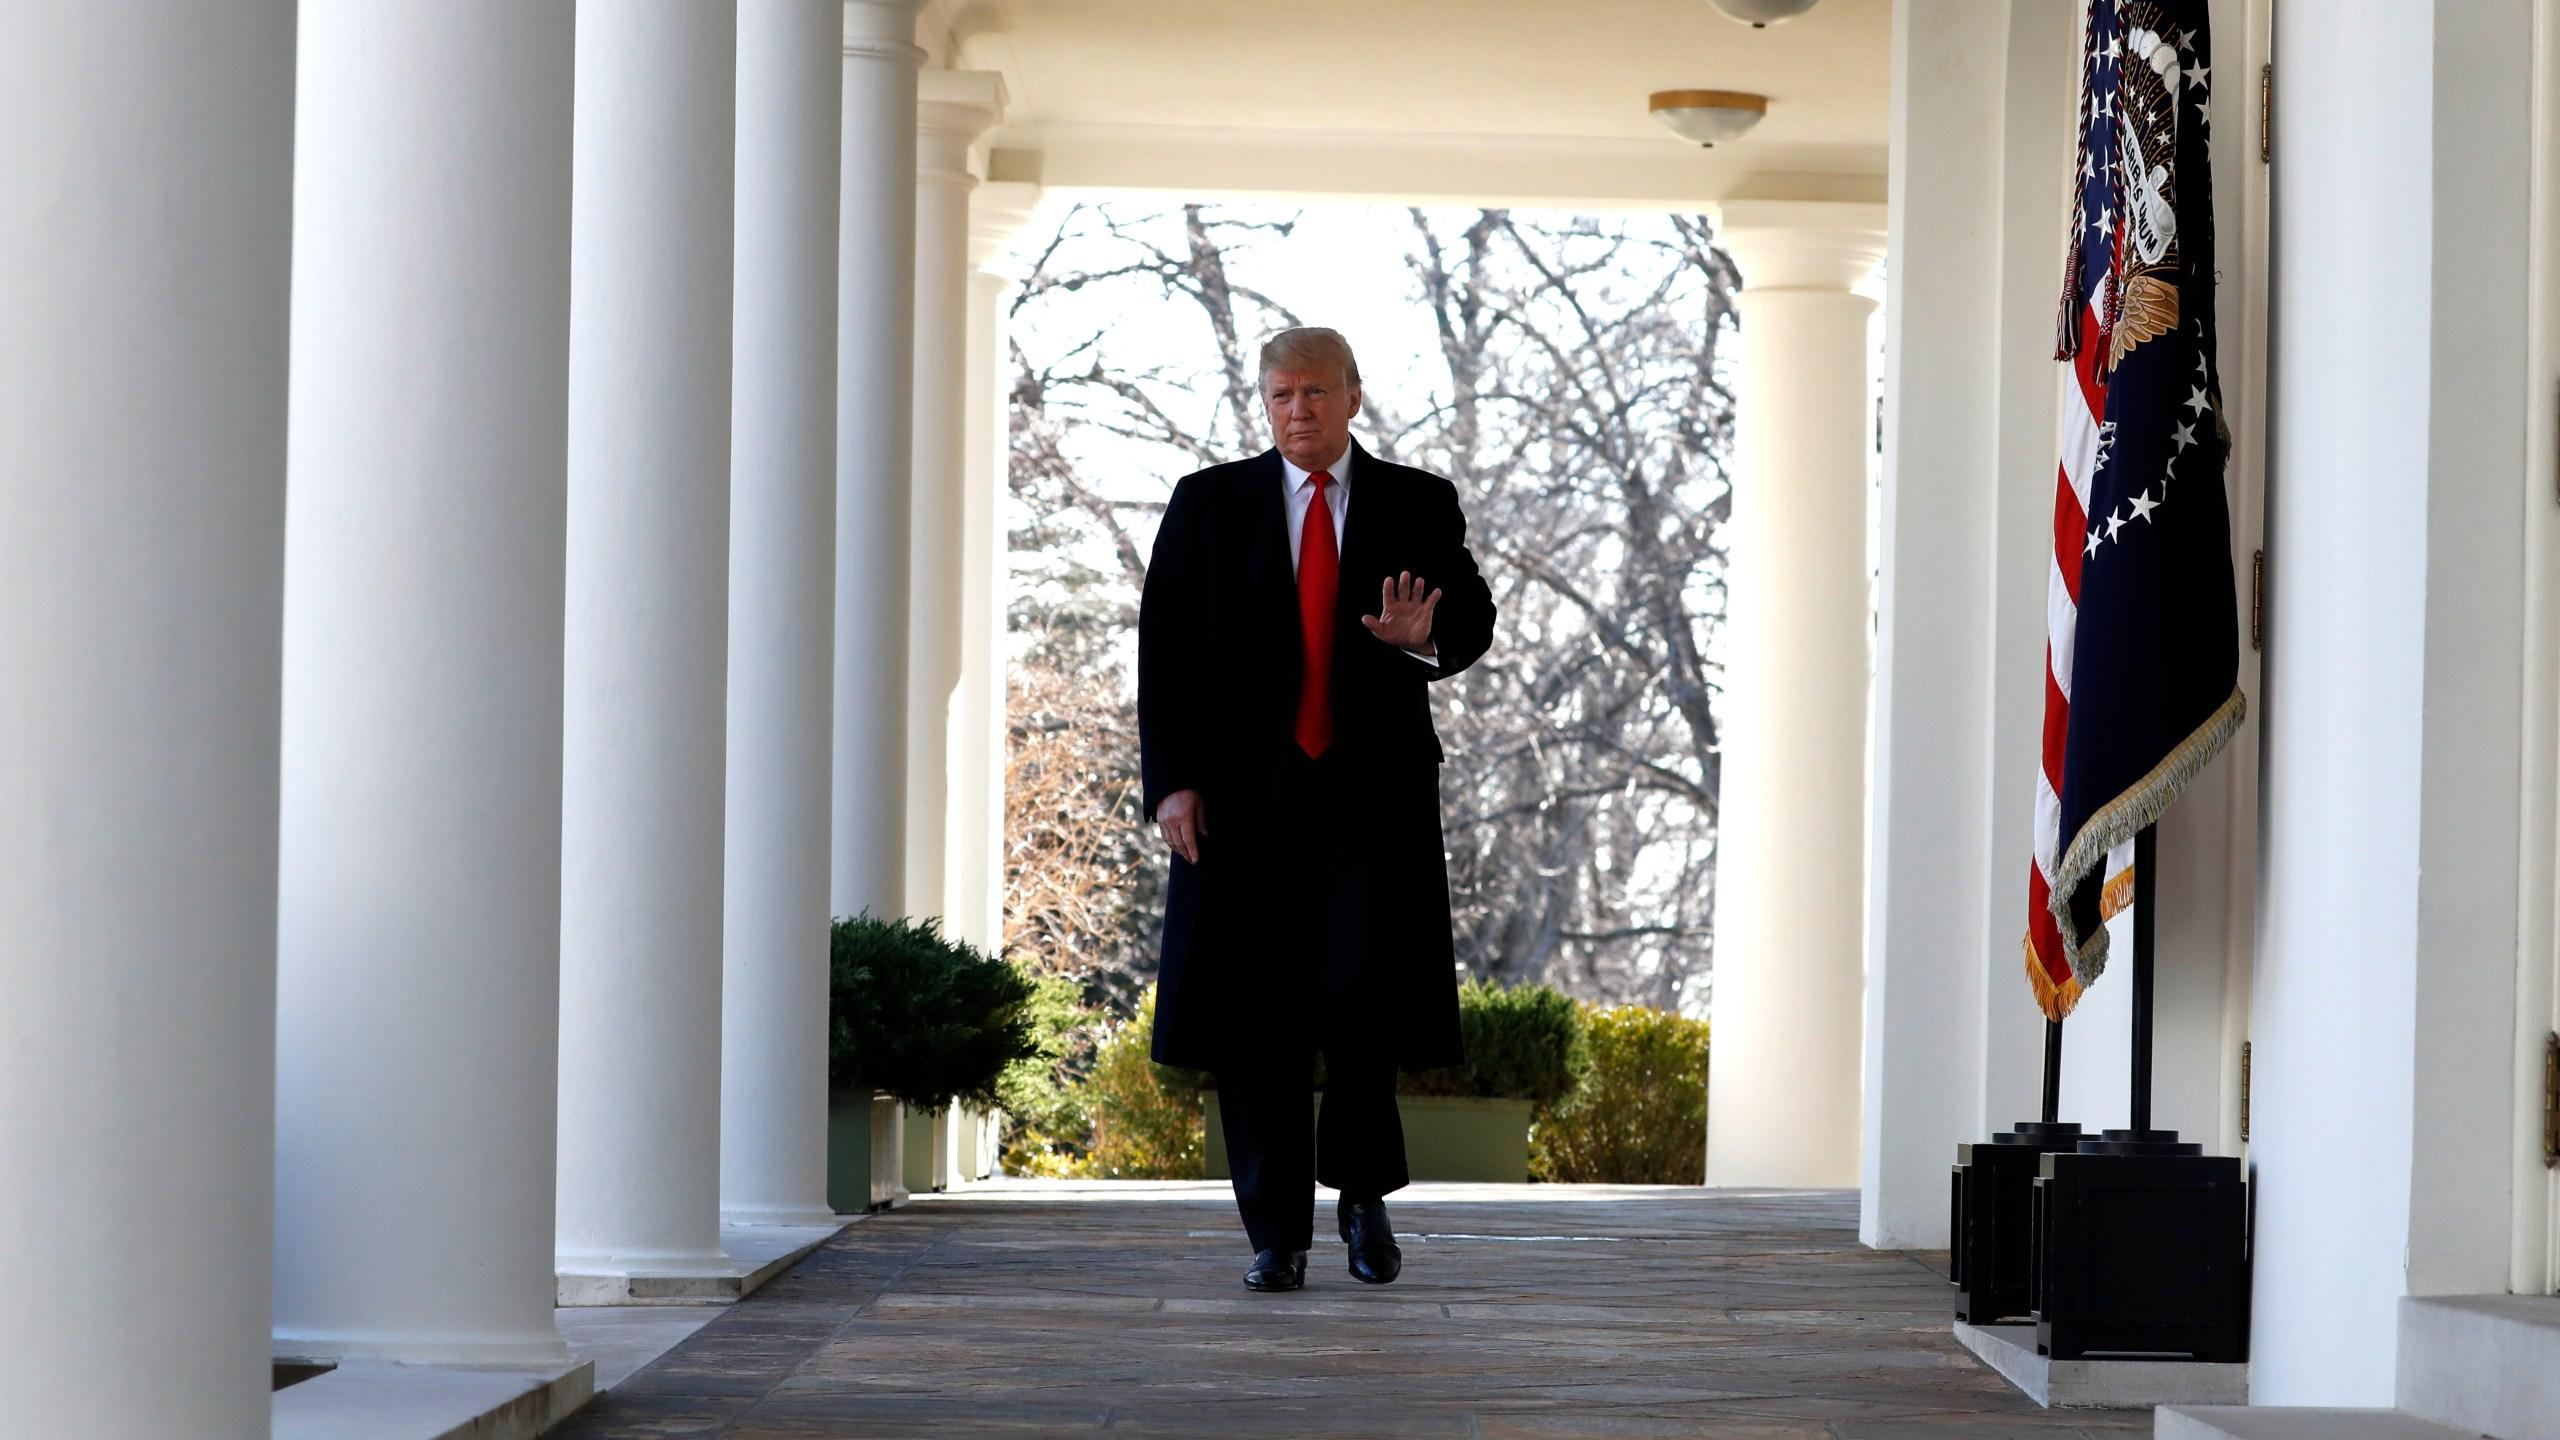 Trump_Government_Shutdown_14421-159532.jpg95045497